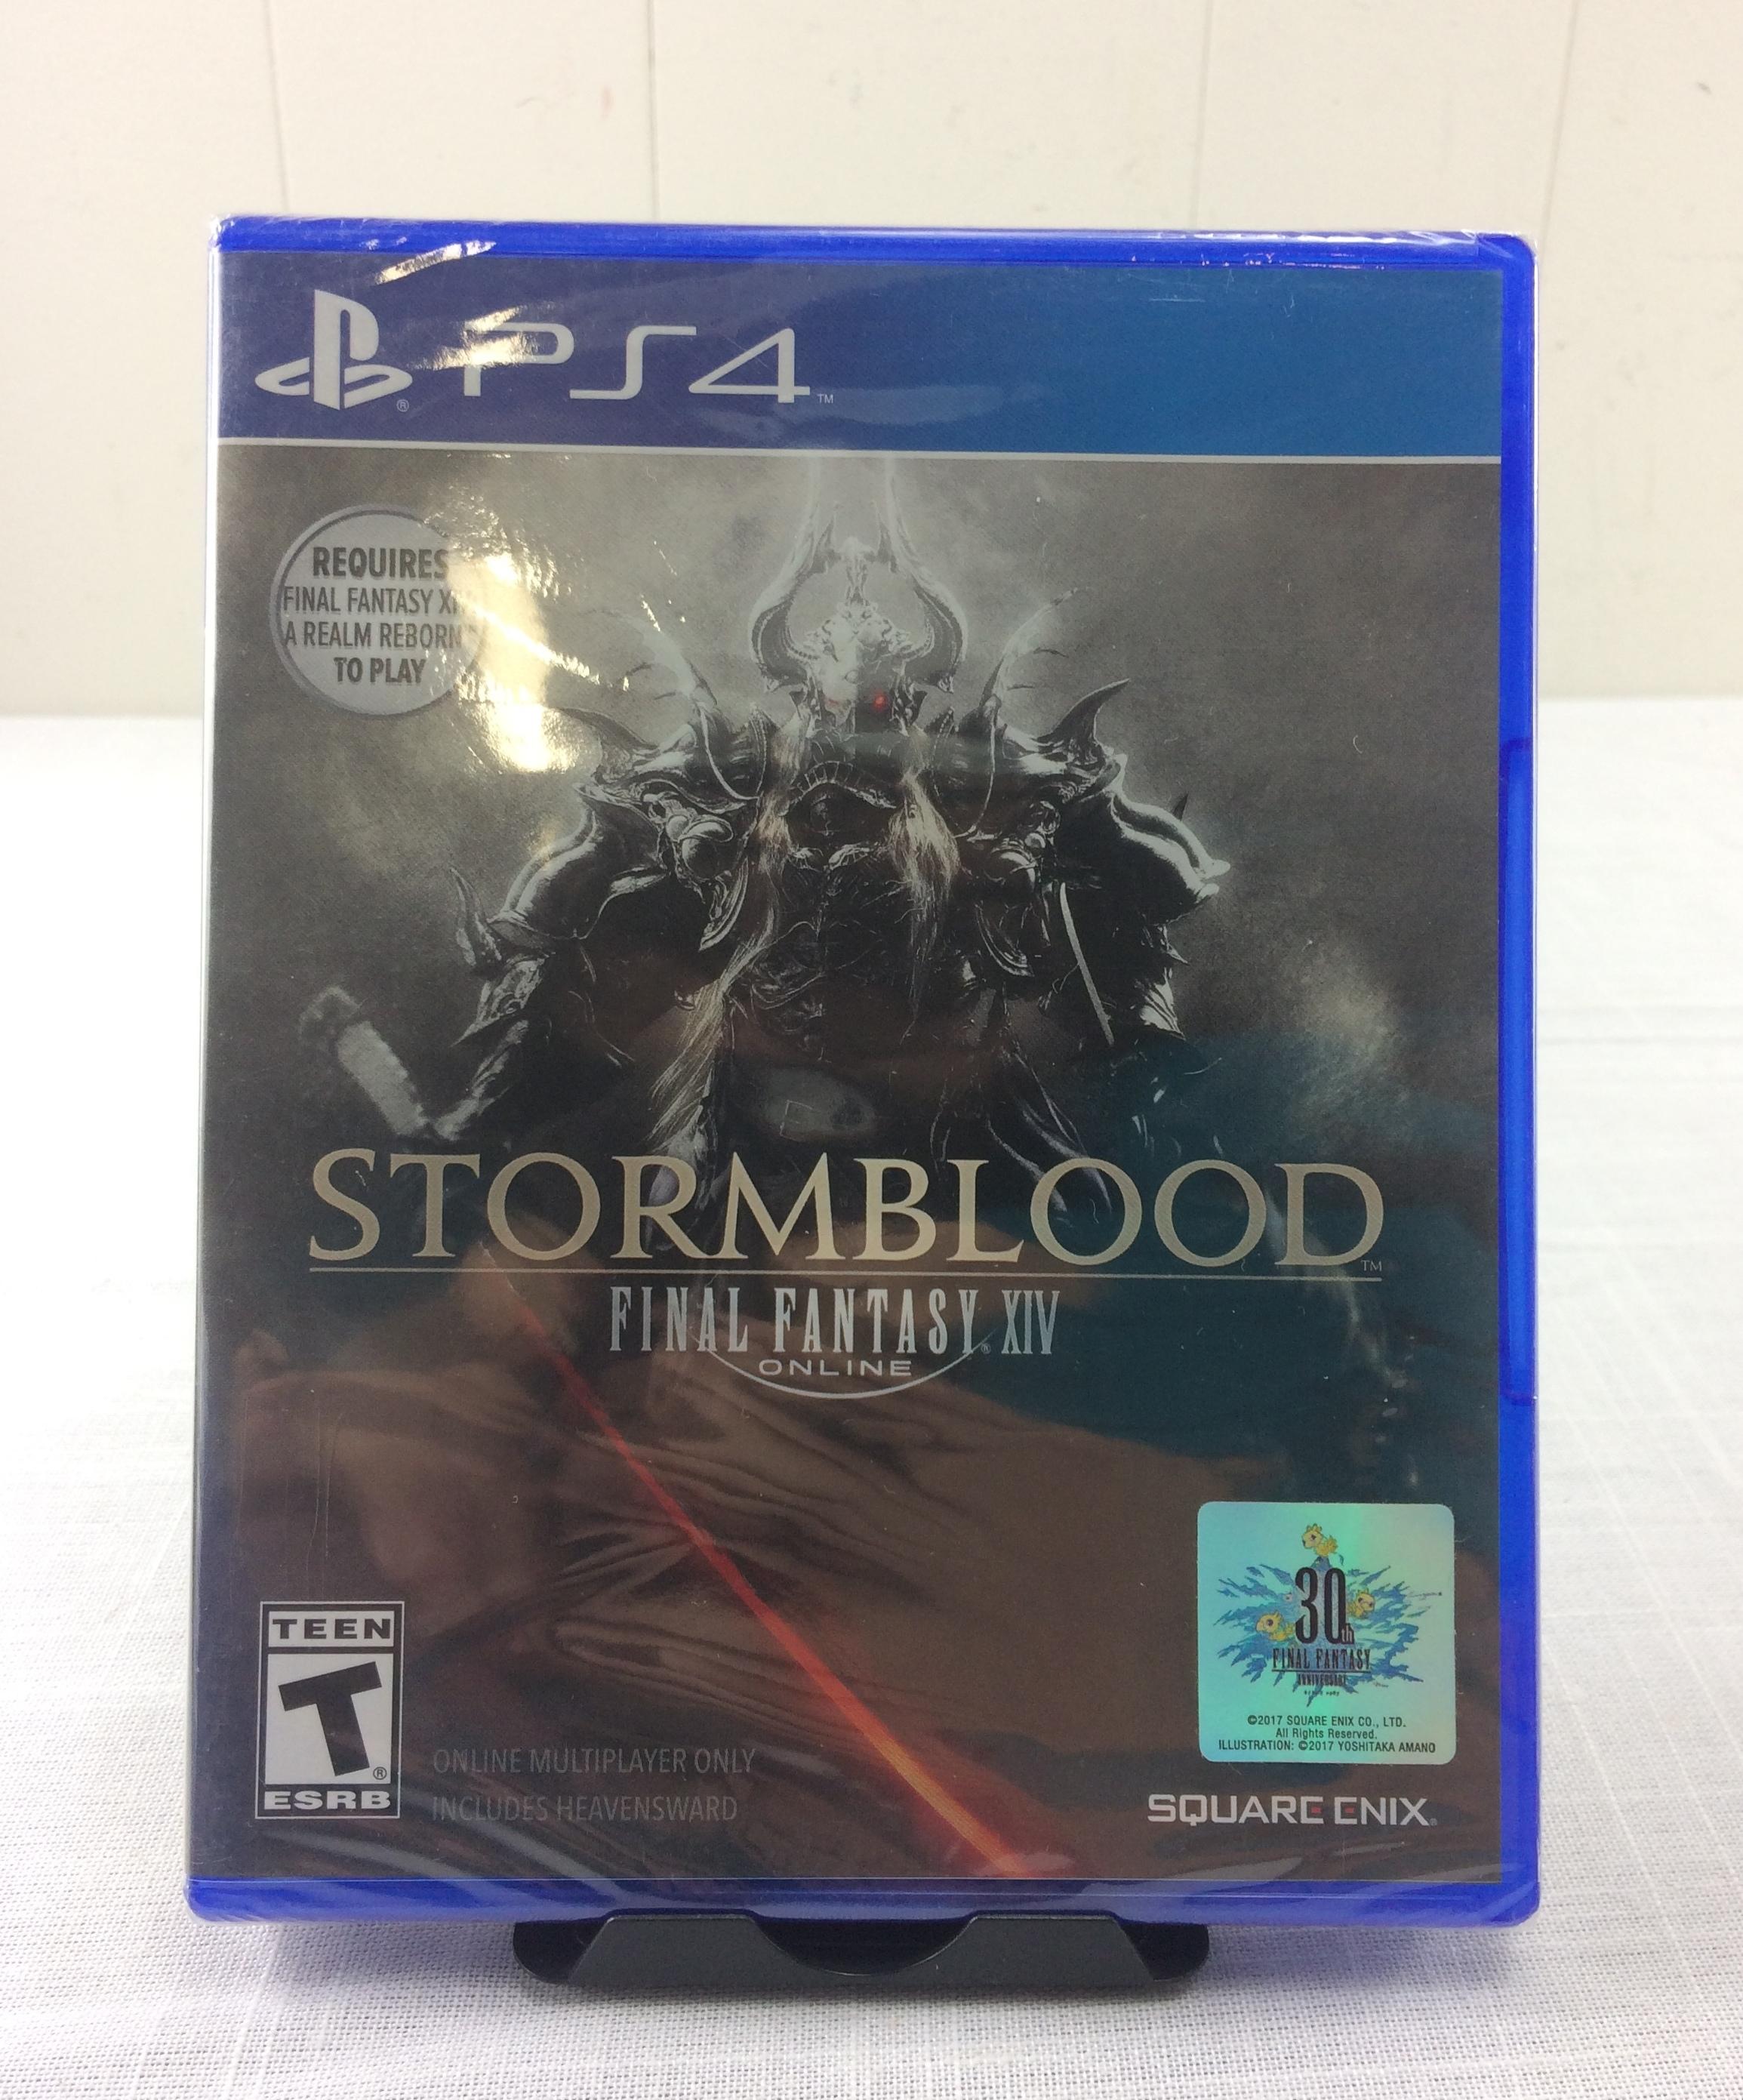 Final Fantasy XIV Stormblood - Playstation 4 - New/Sealed